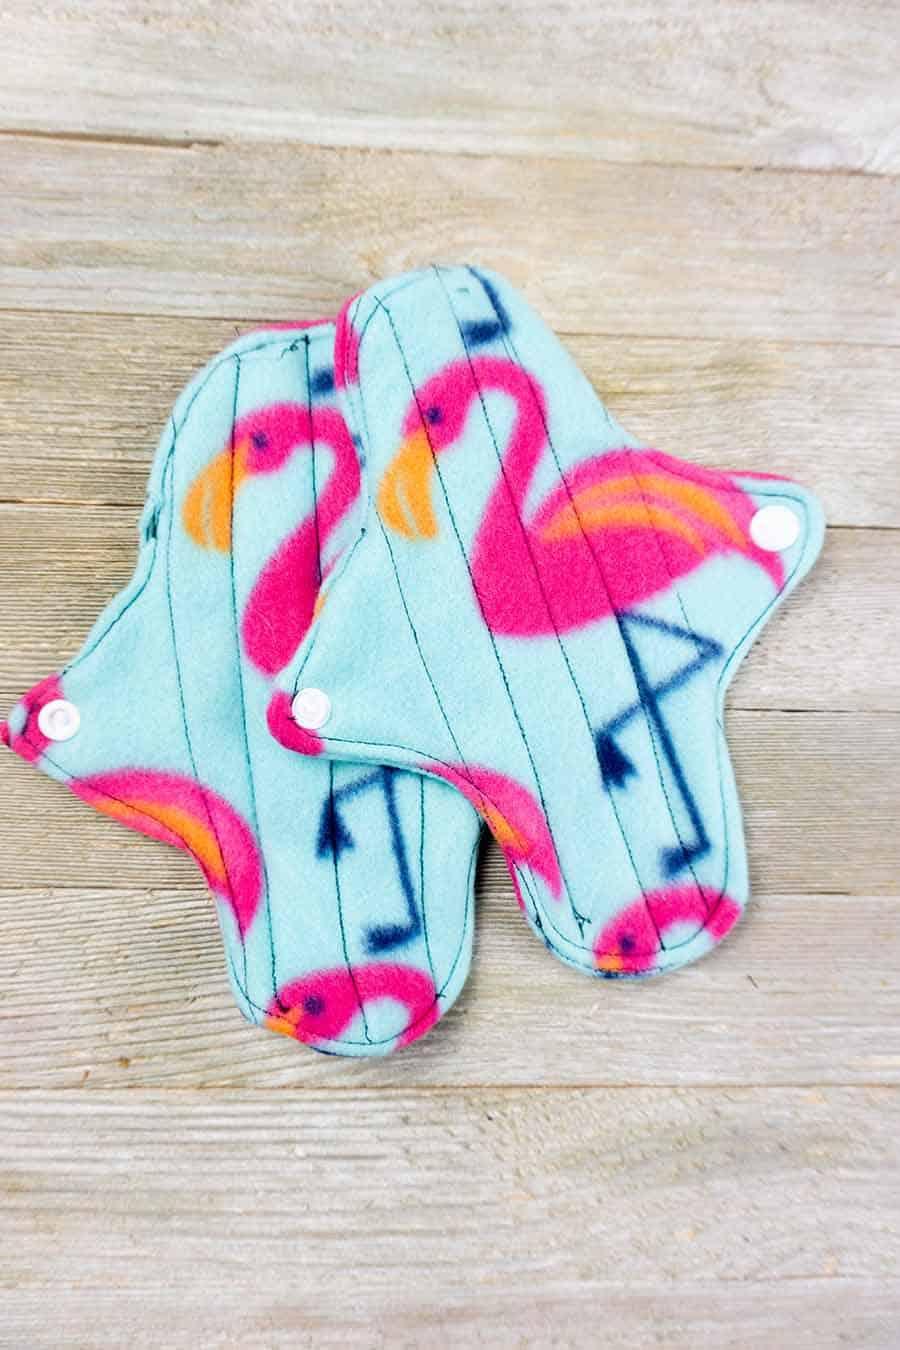 Easy Sew Women's Sanitary Pads Tutorial